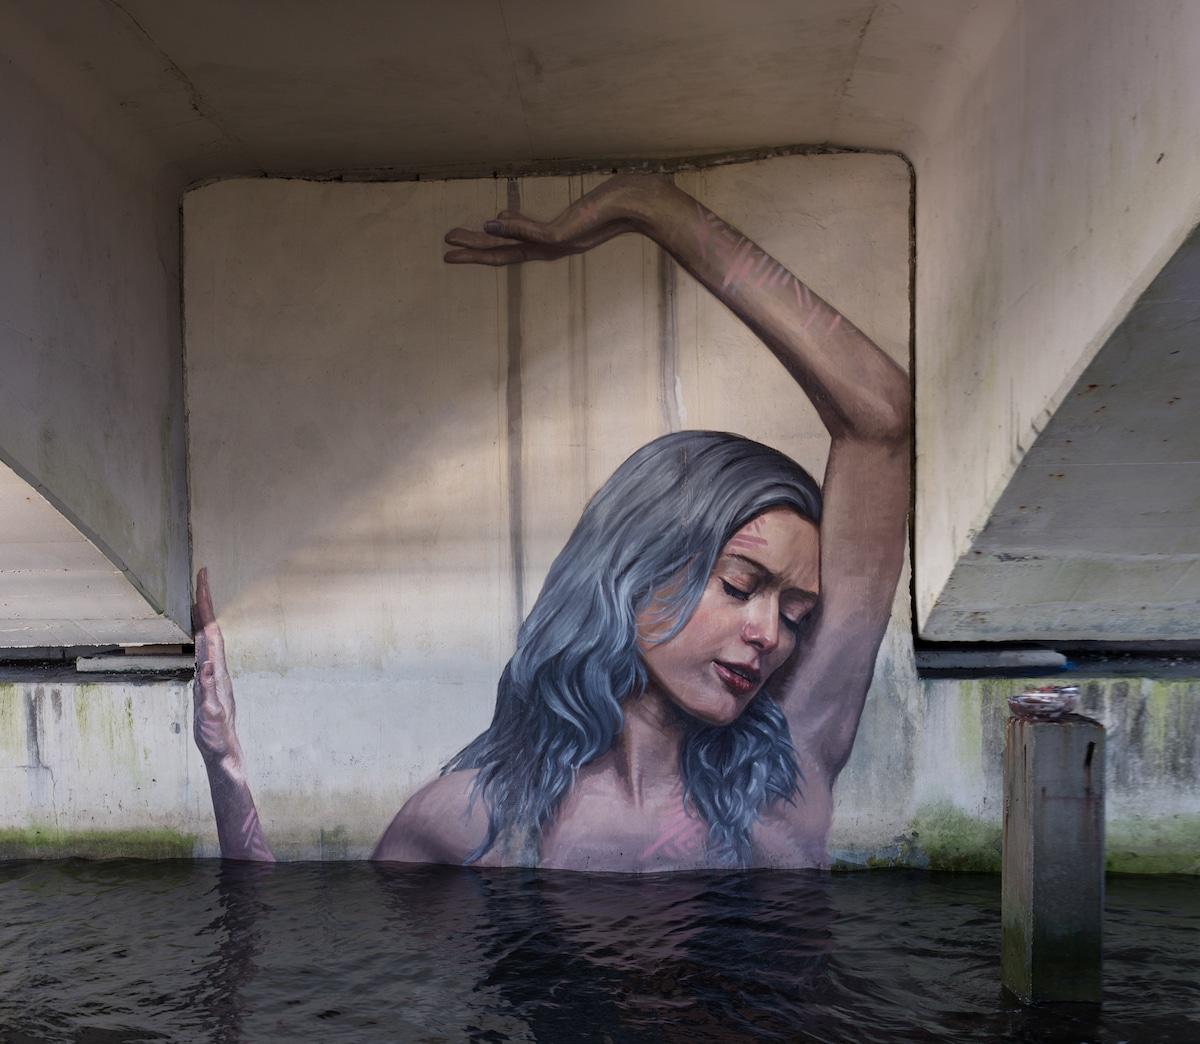 Hula - Sean Yoro - Environmental Street Art